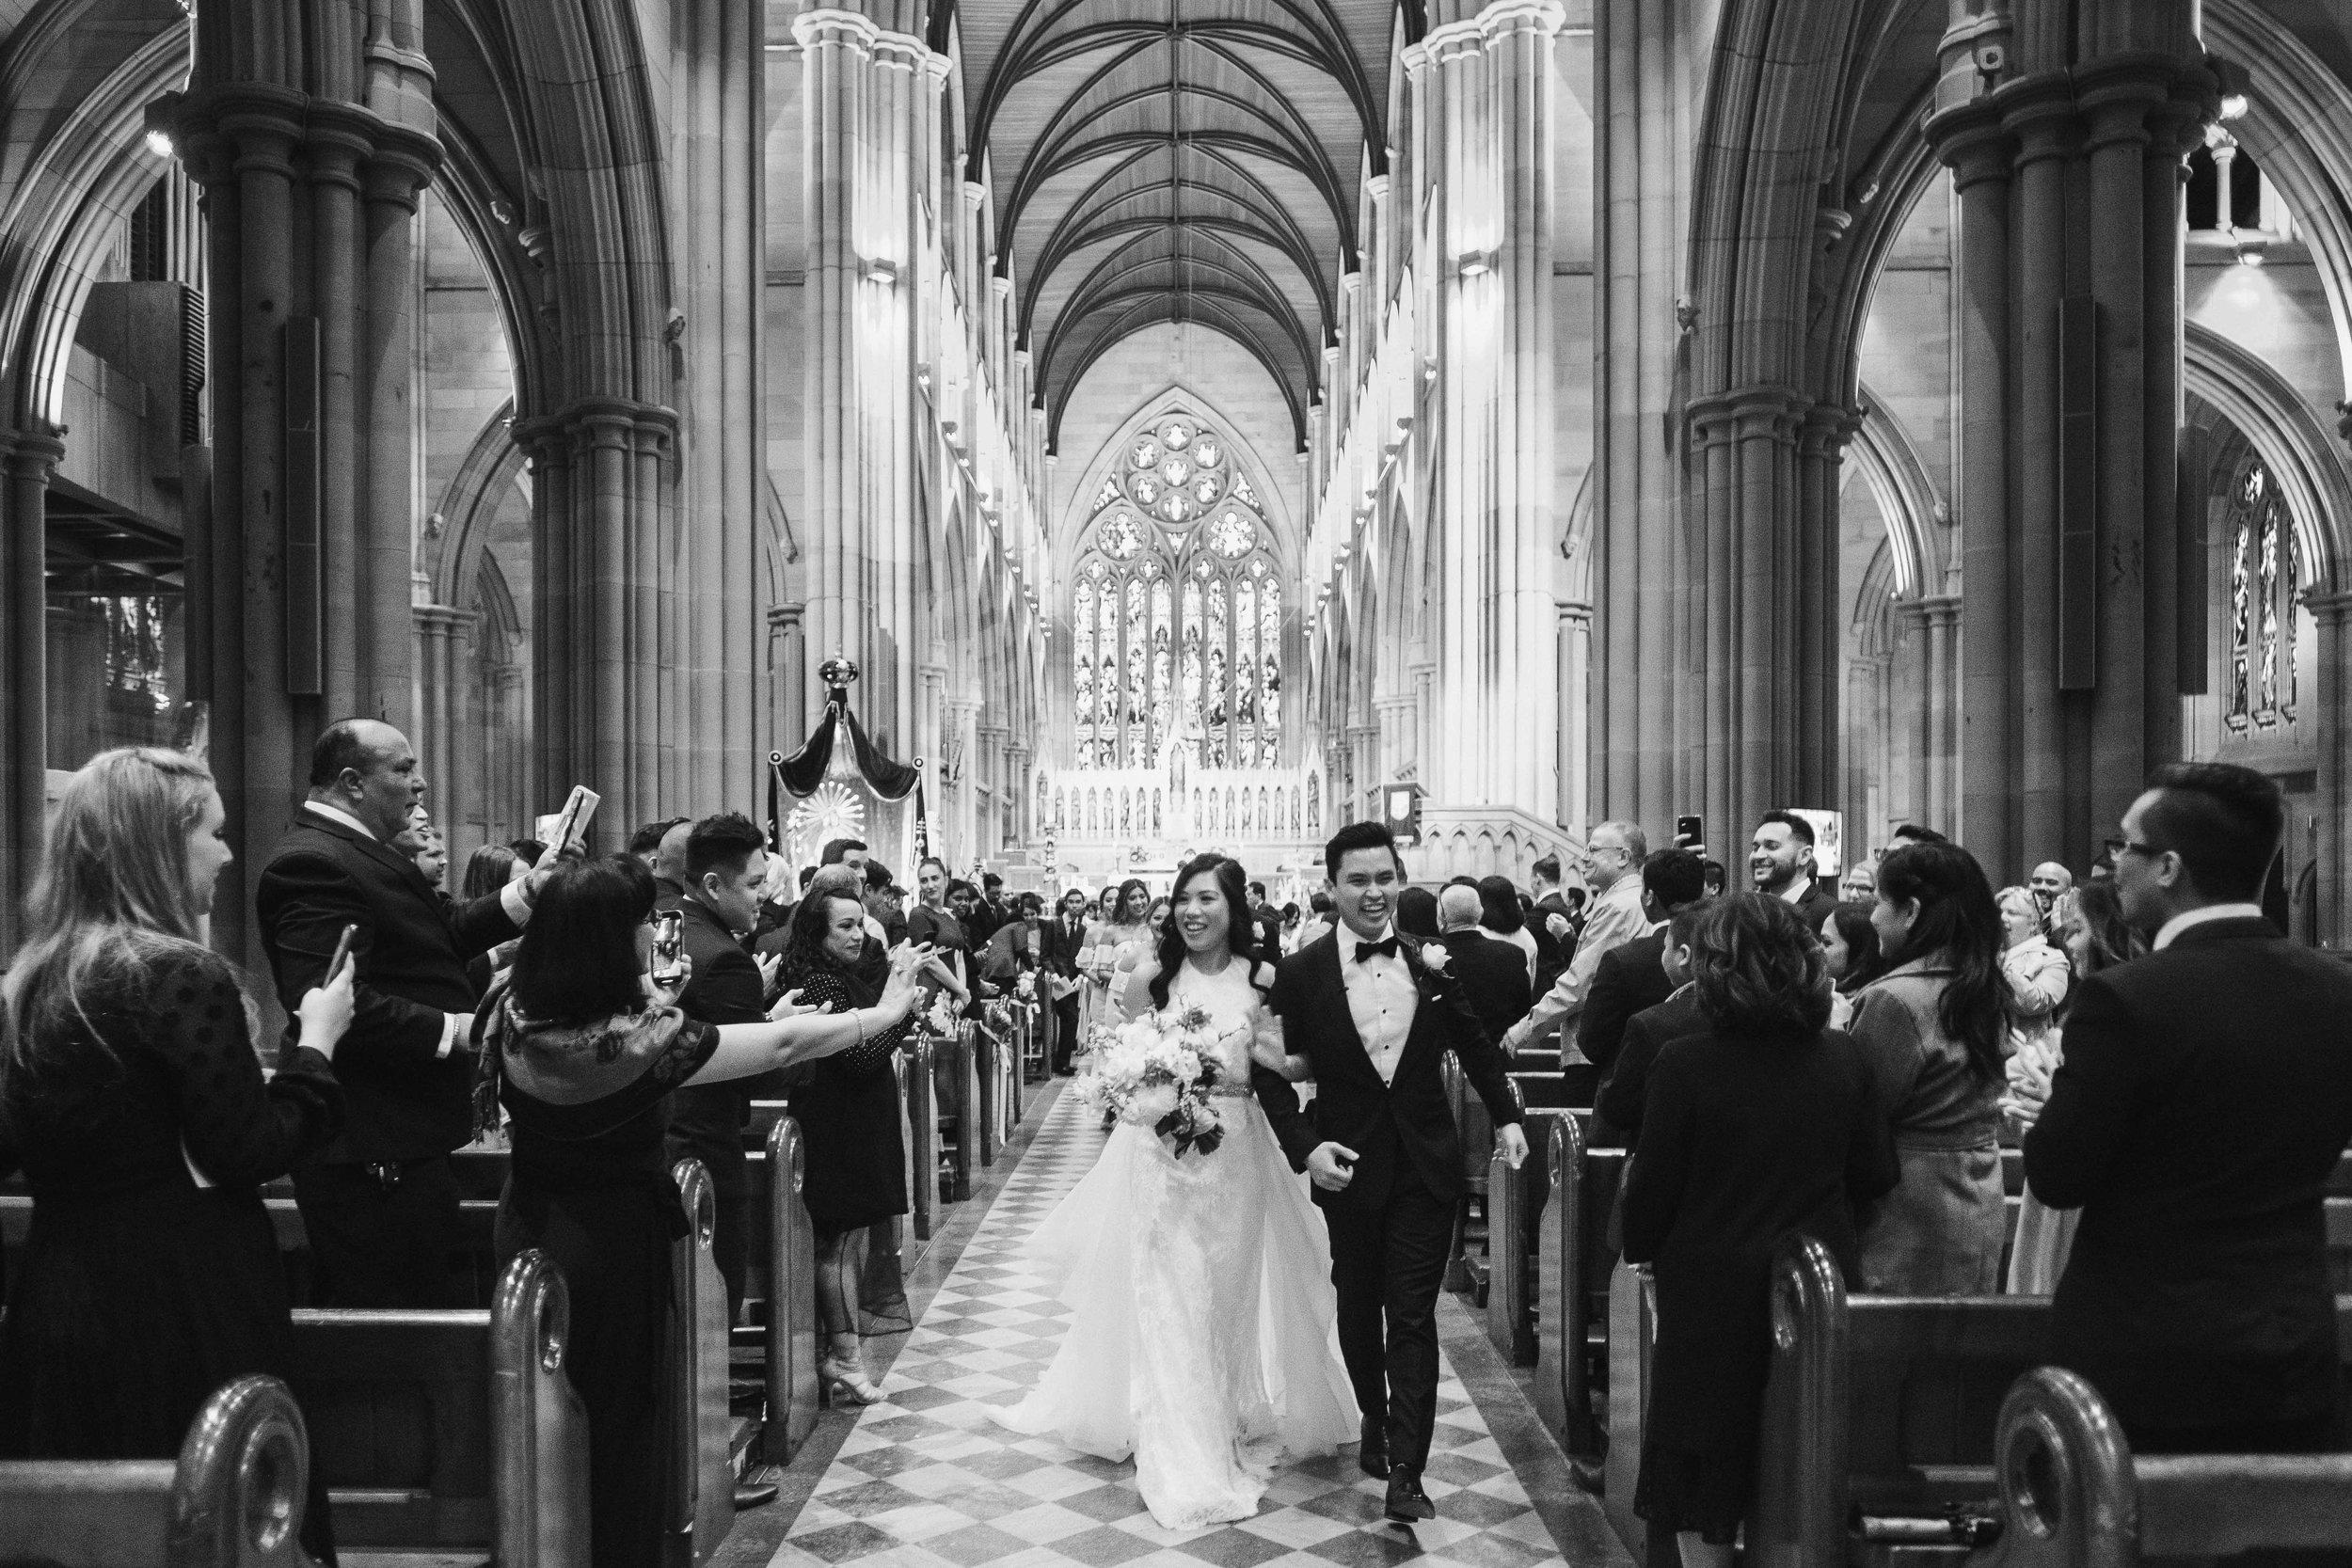 Maria and Gerald Sydney wedding by Milton Gan Photography 23.jpg